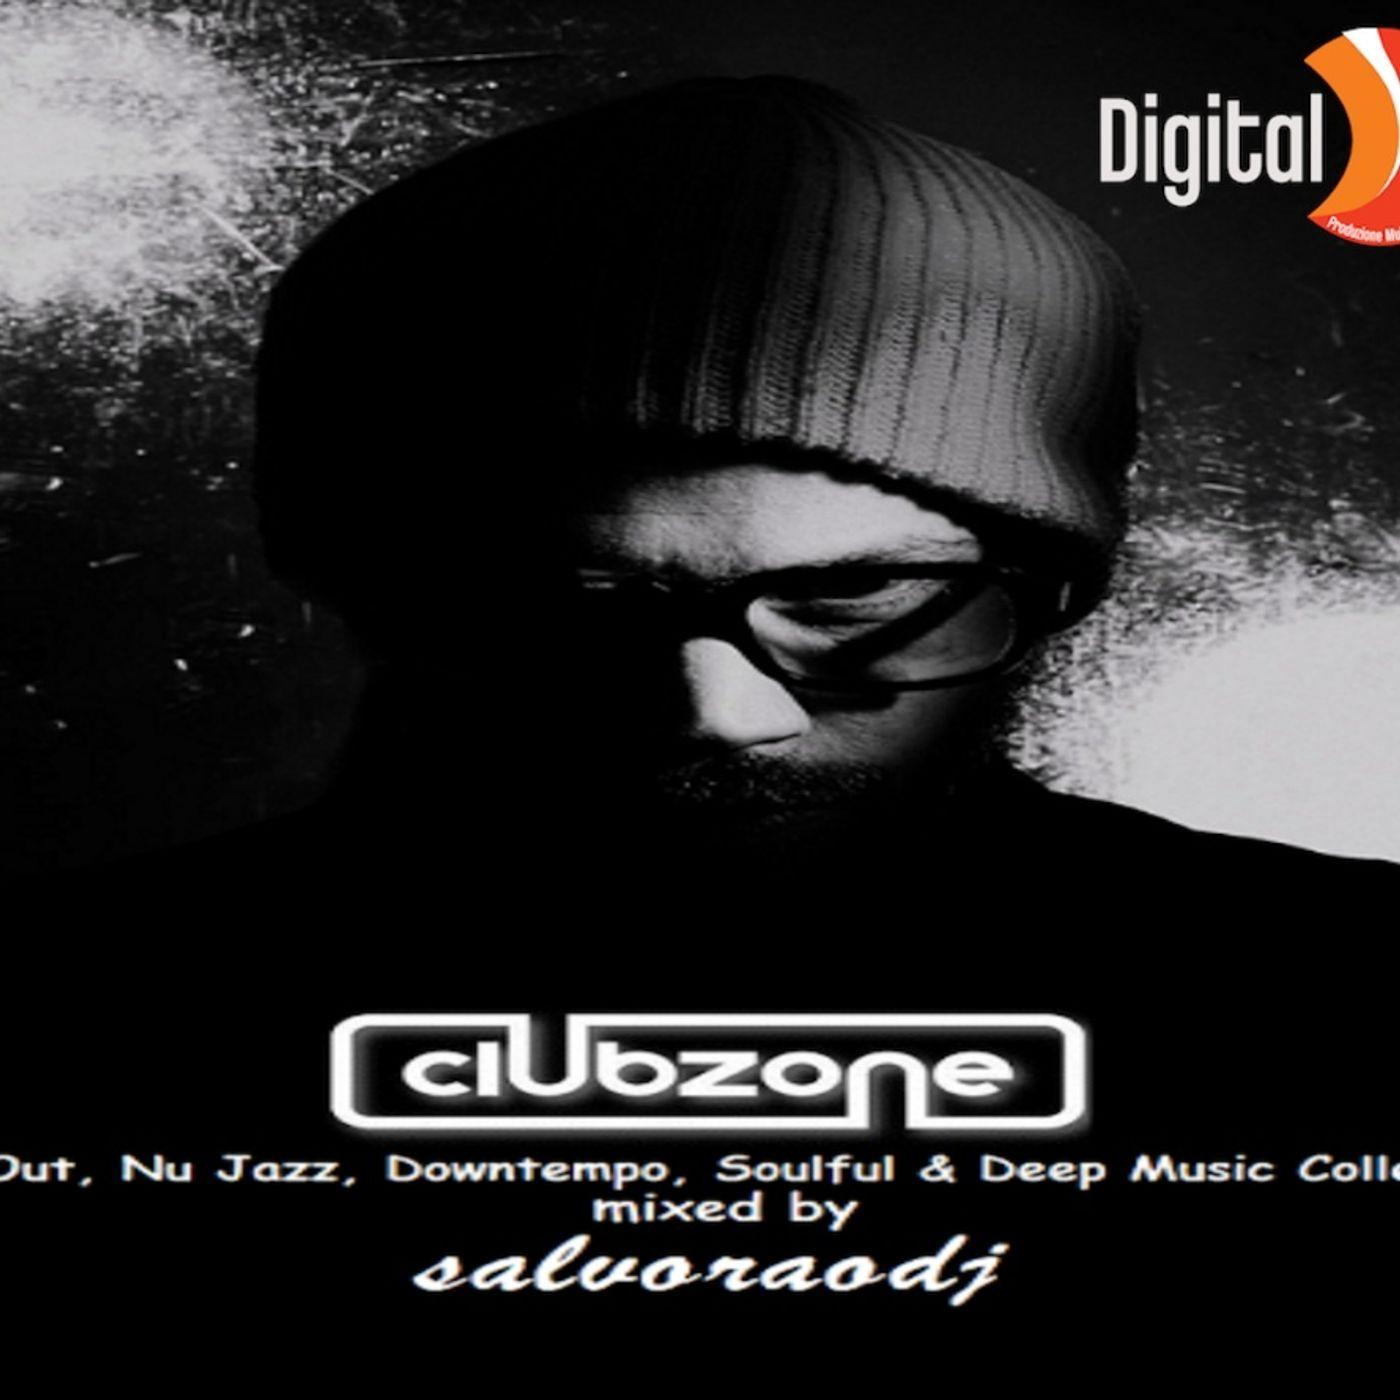 clubzone 1 parte